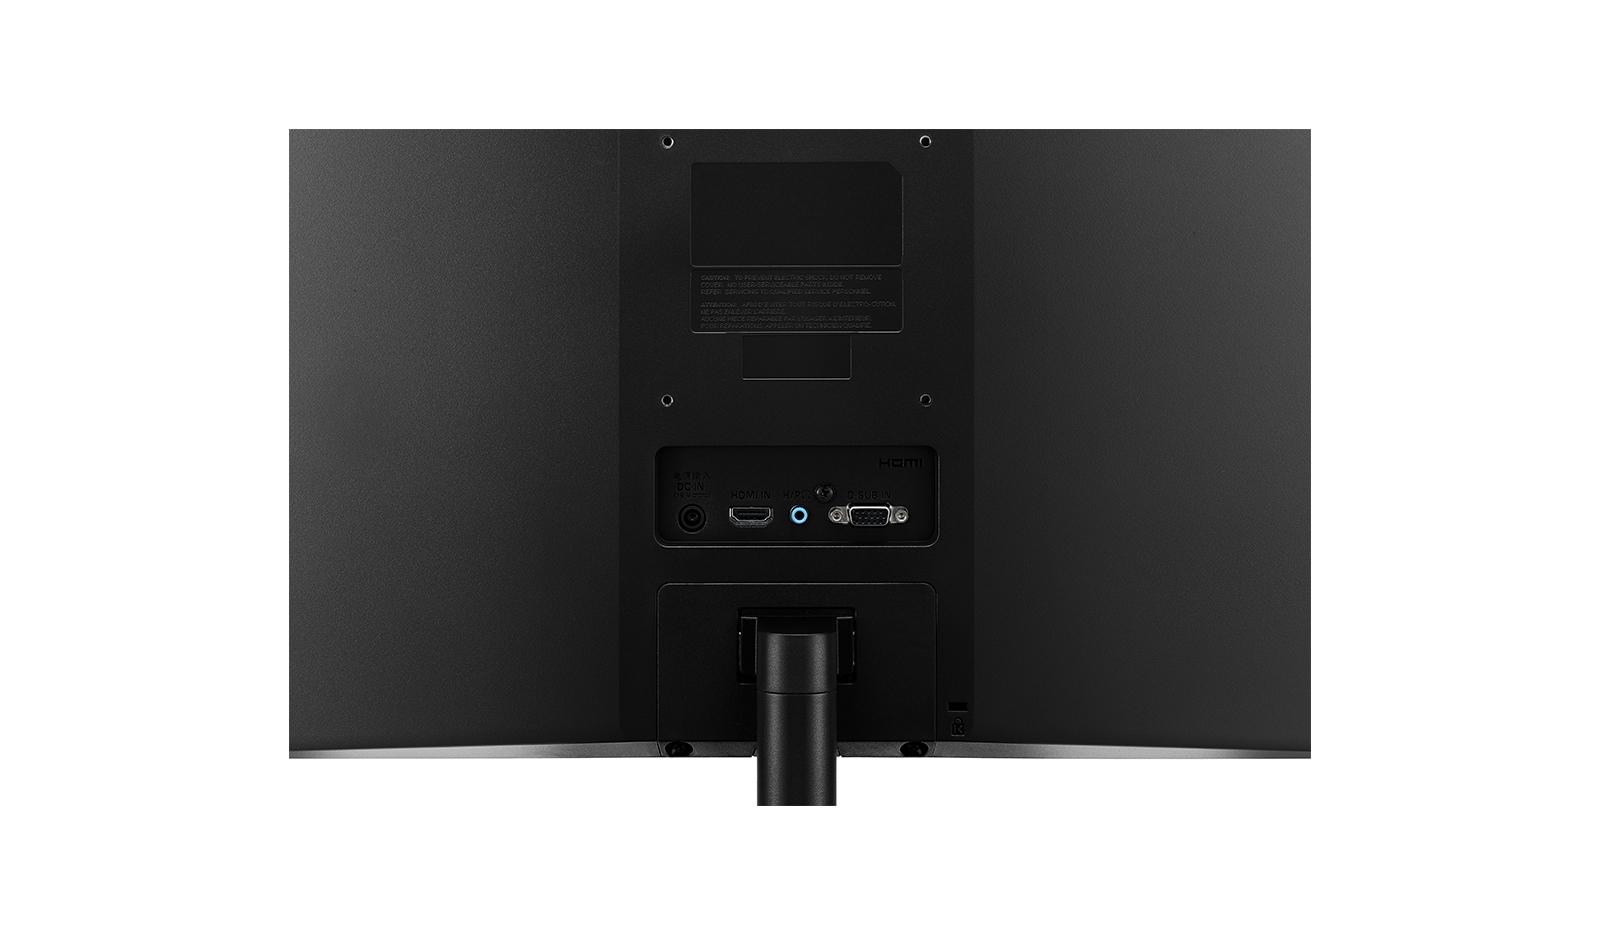 LG 27MK400H 27Inch monitor, full hd (1080p) TN, LED, HDMI, VGA, Vesa, 1000:1 - 2 ms, Black